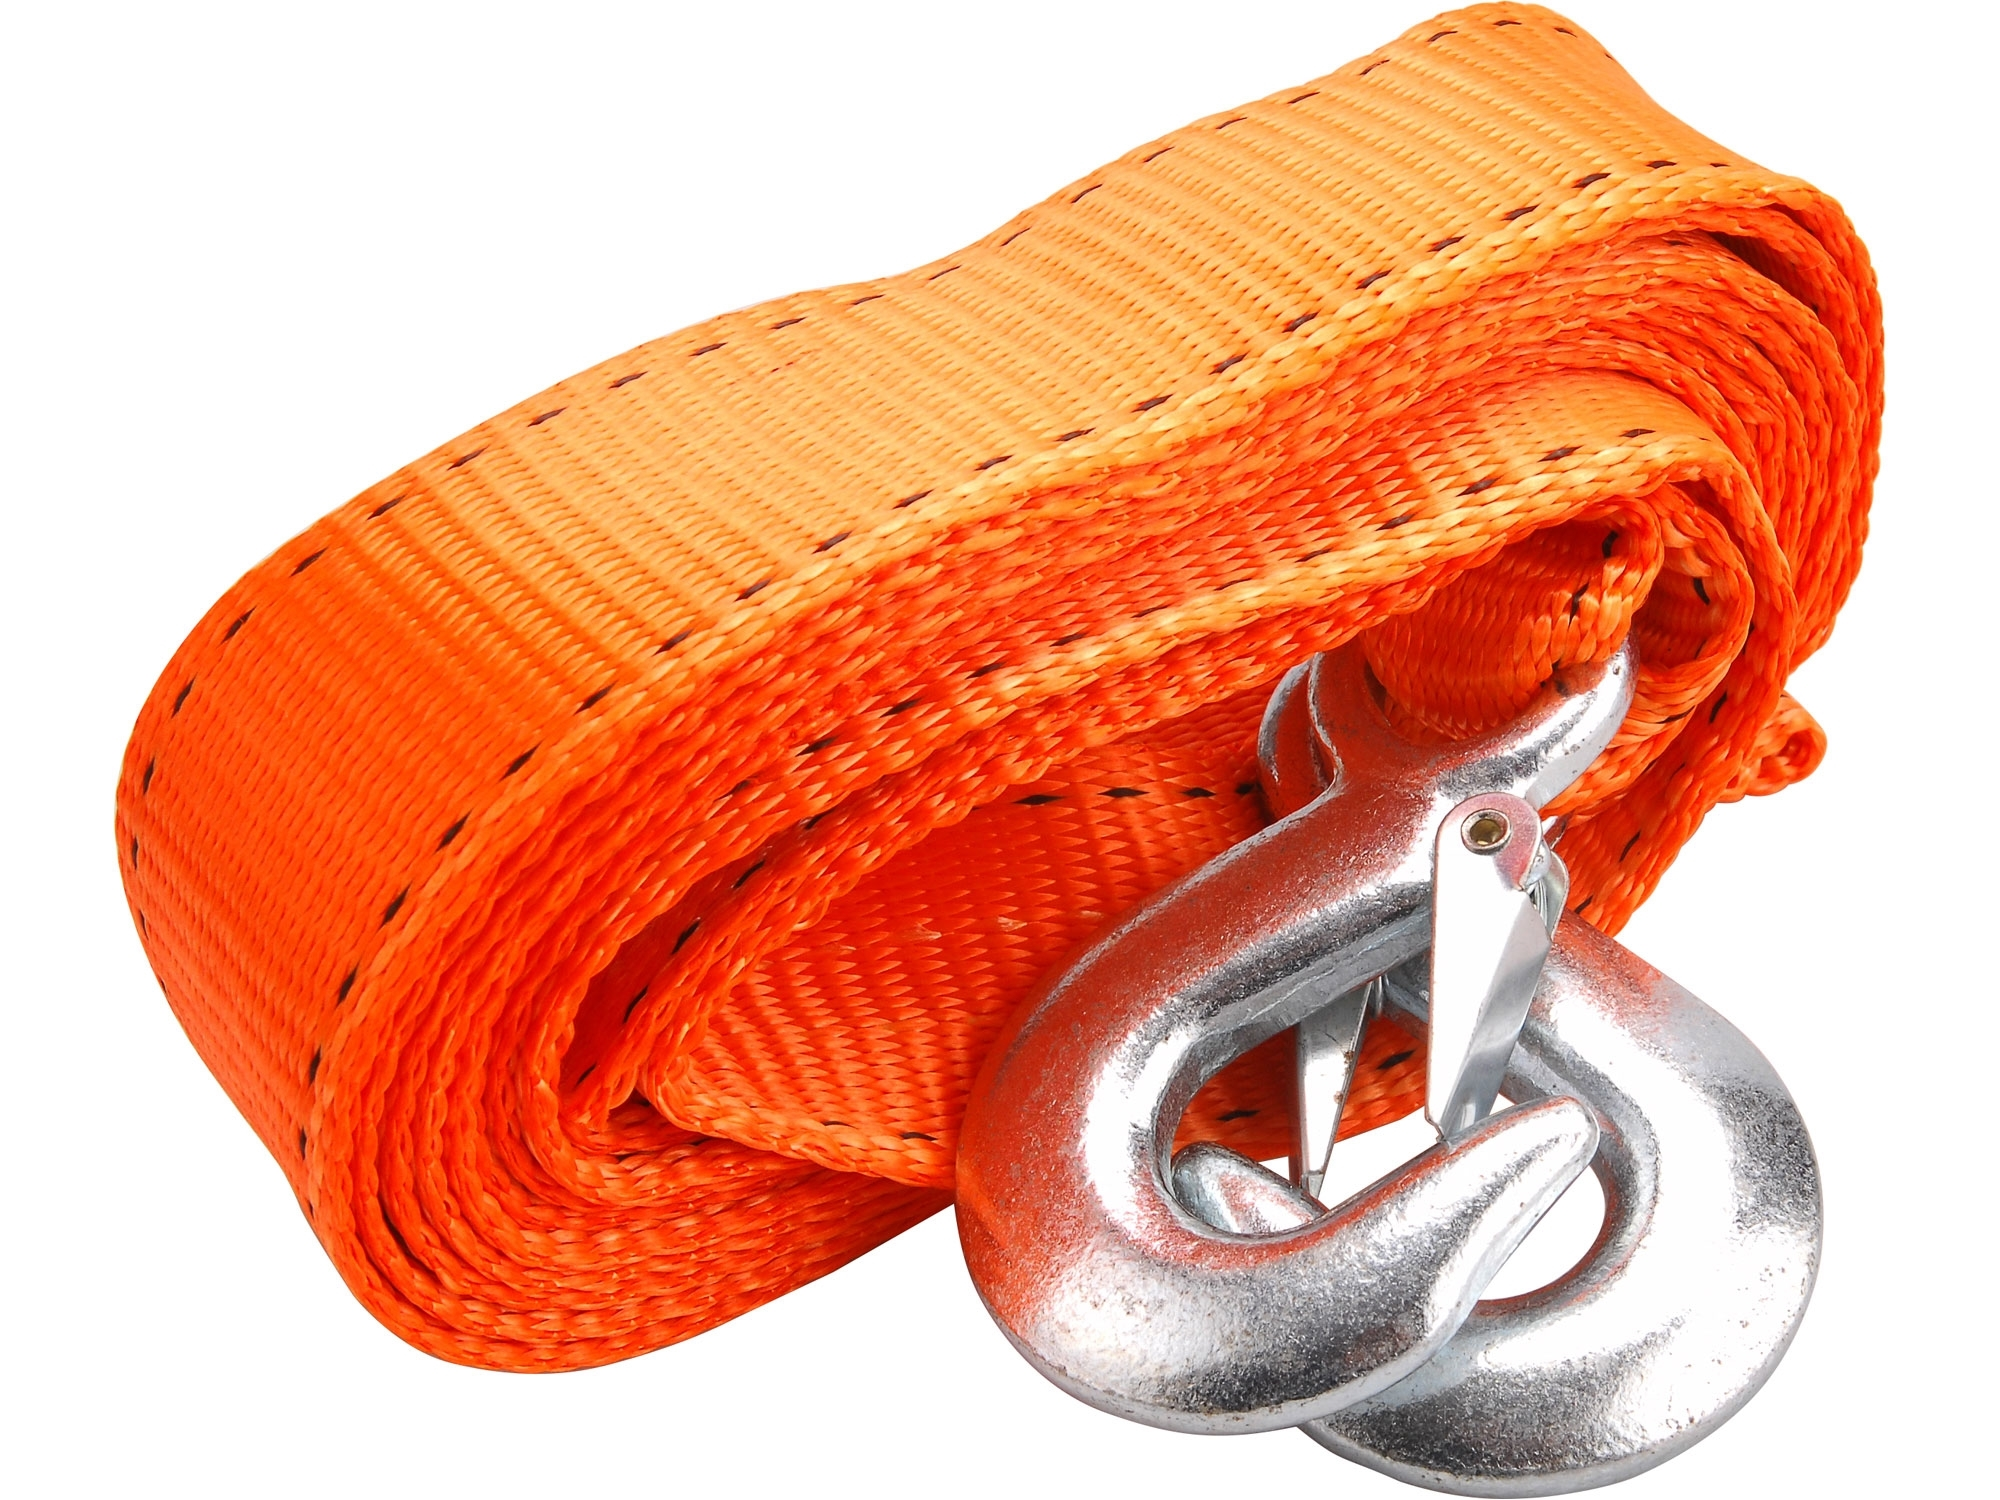 lano tažné - popruh s háky, 4m x 50mm, max. tažnost - 2800kg